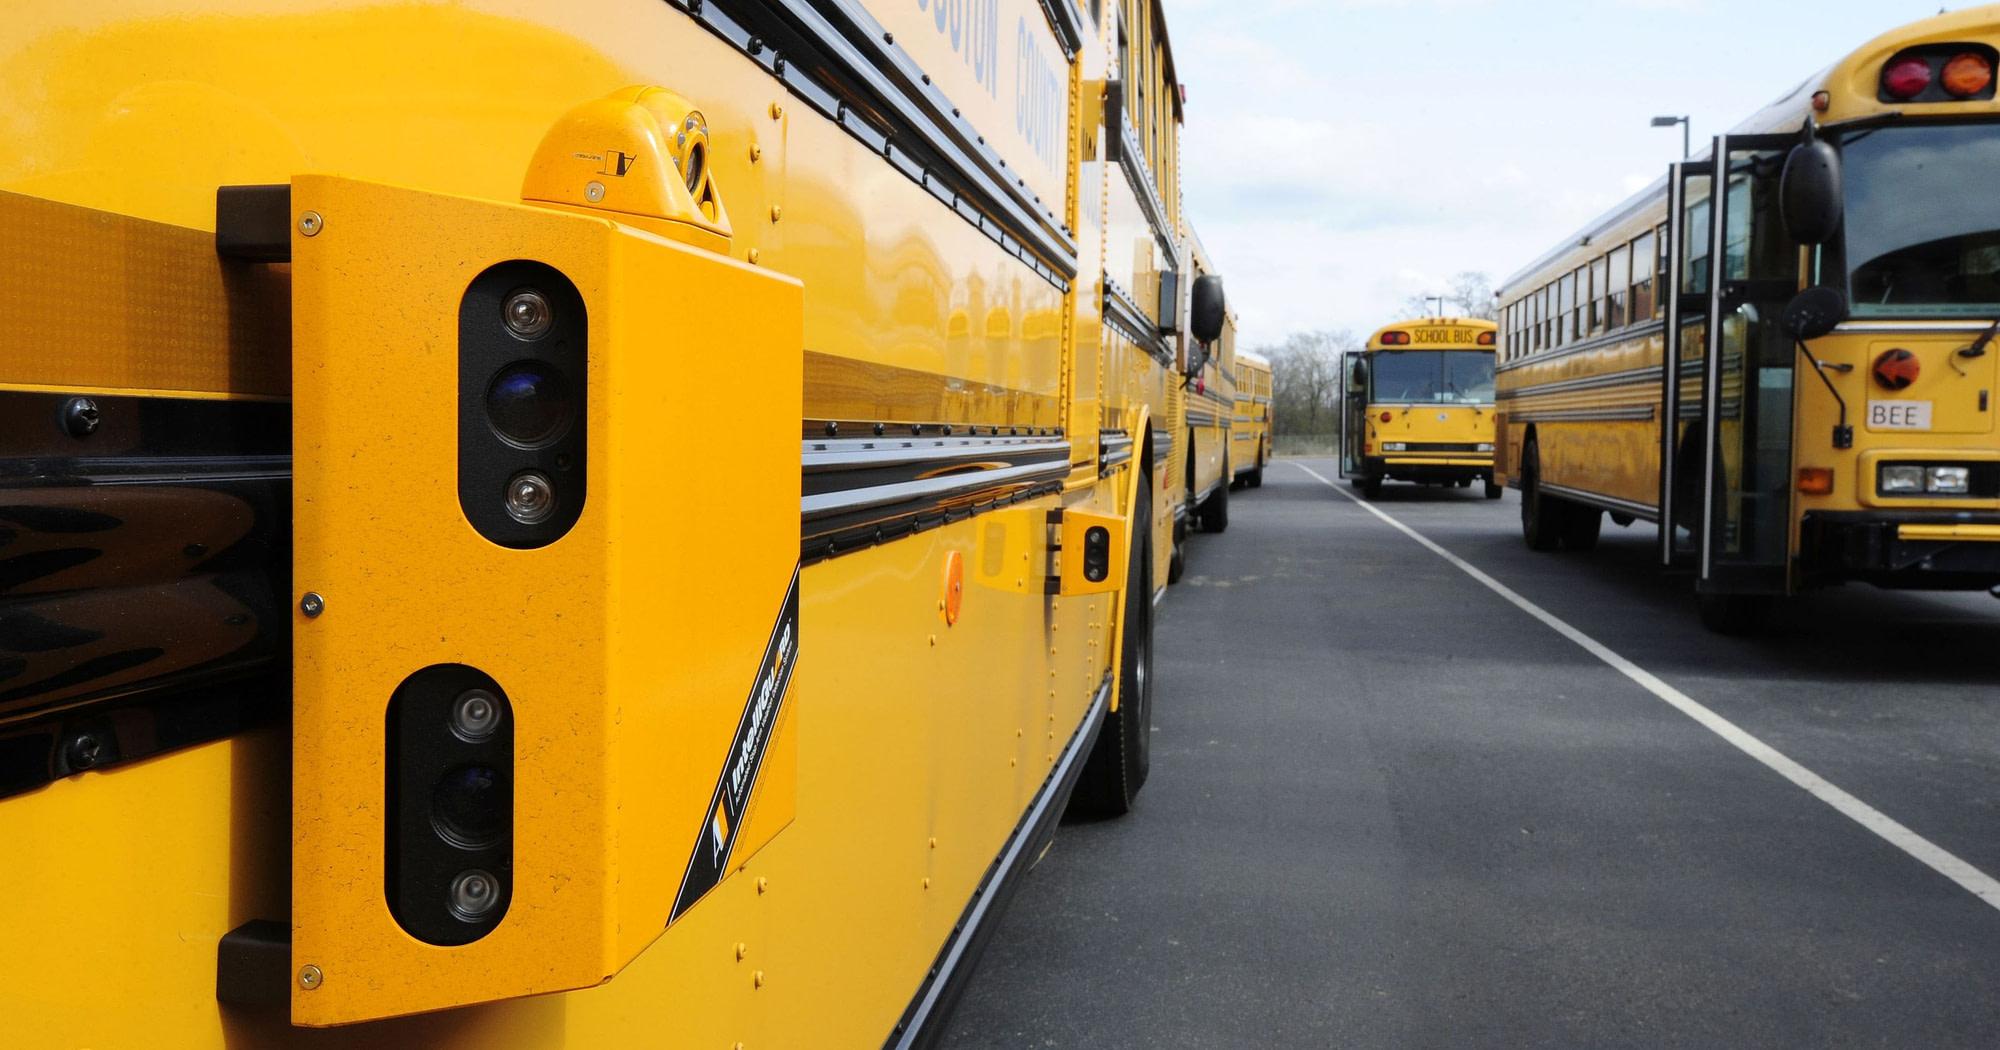 Bus Rear Camera